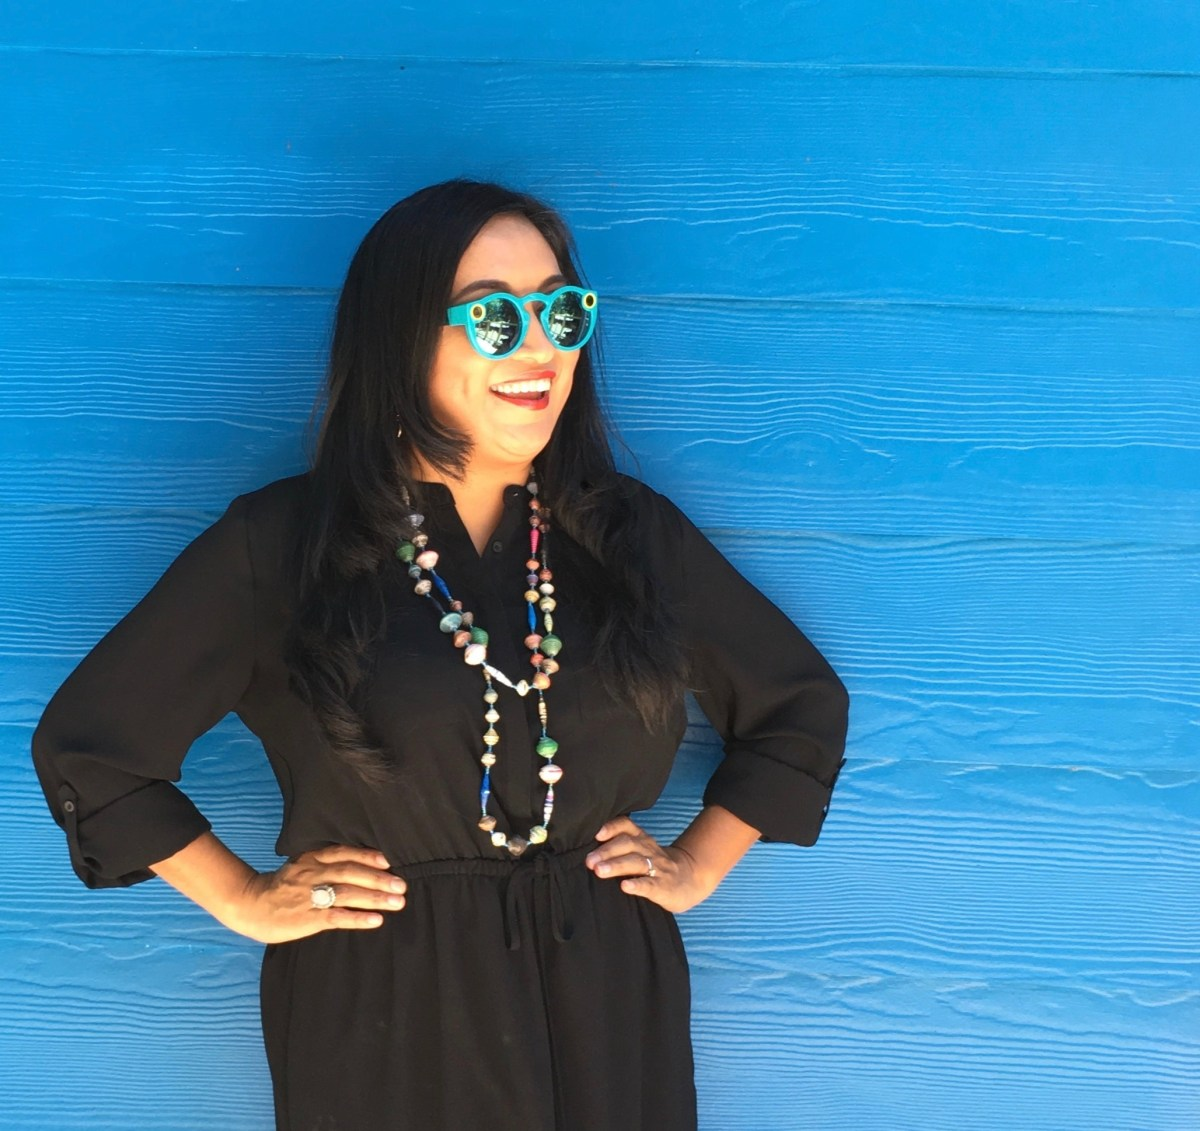 Hire Melanie! She's Your Next Speaker, Blogger or Social Media Consultant